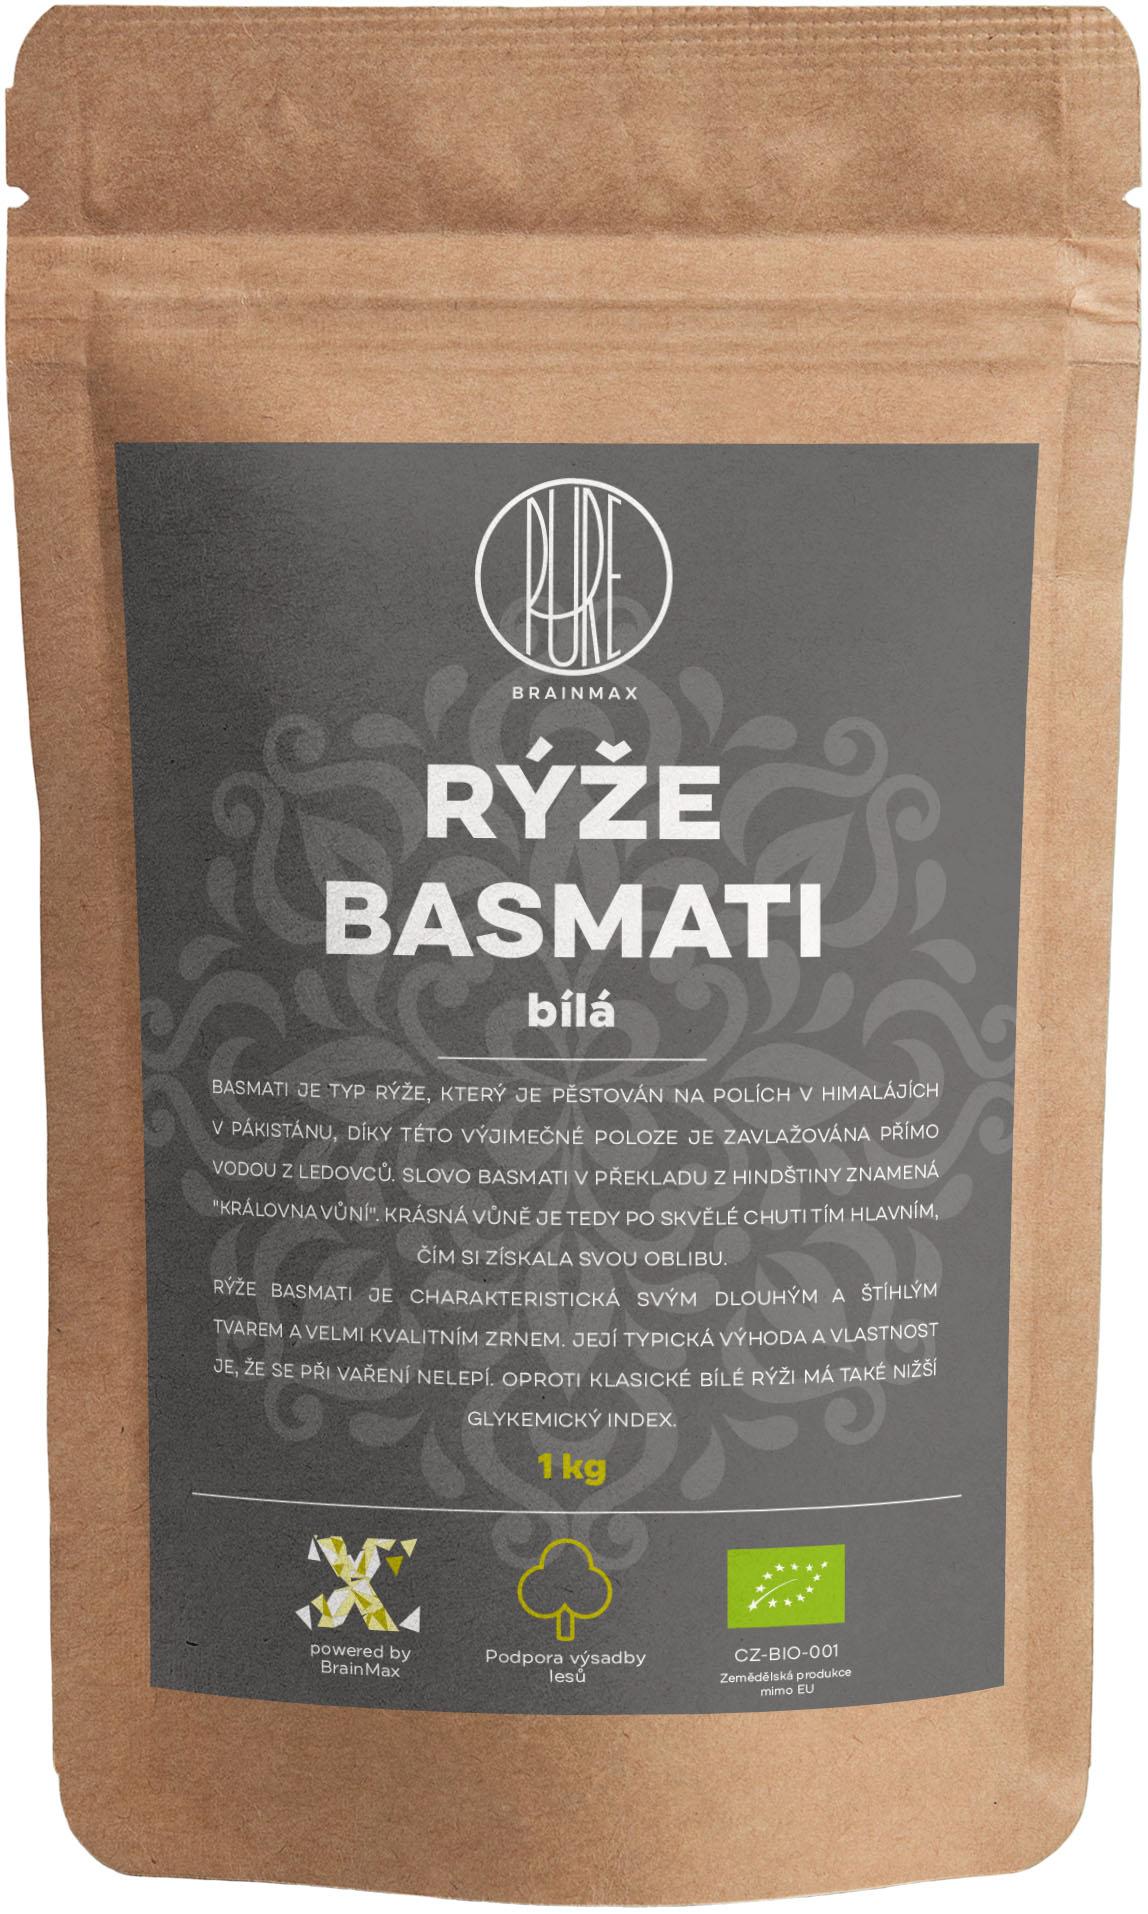 BrainMax Pure Rýže - bílá, Basmati BIO, 1kg *CZ-BIO-001 certifikát